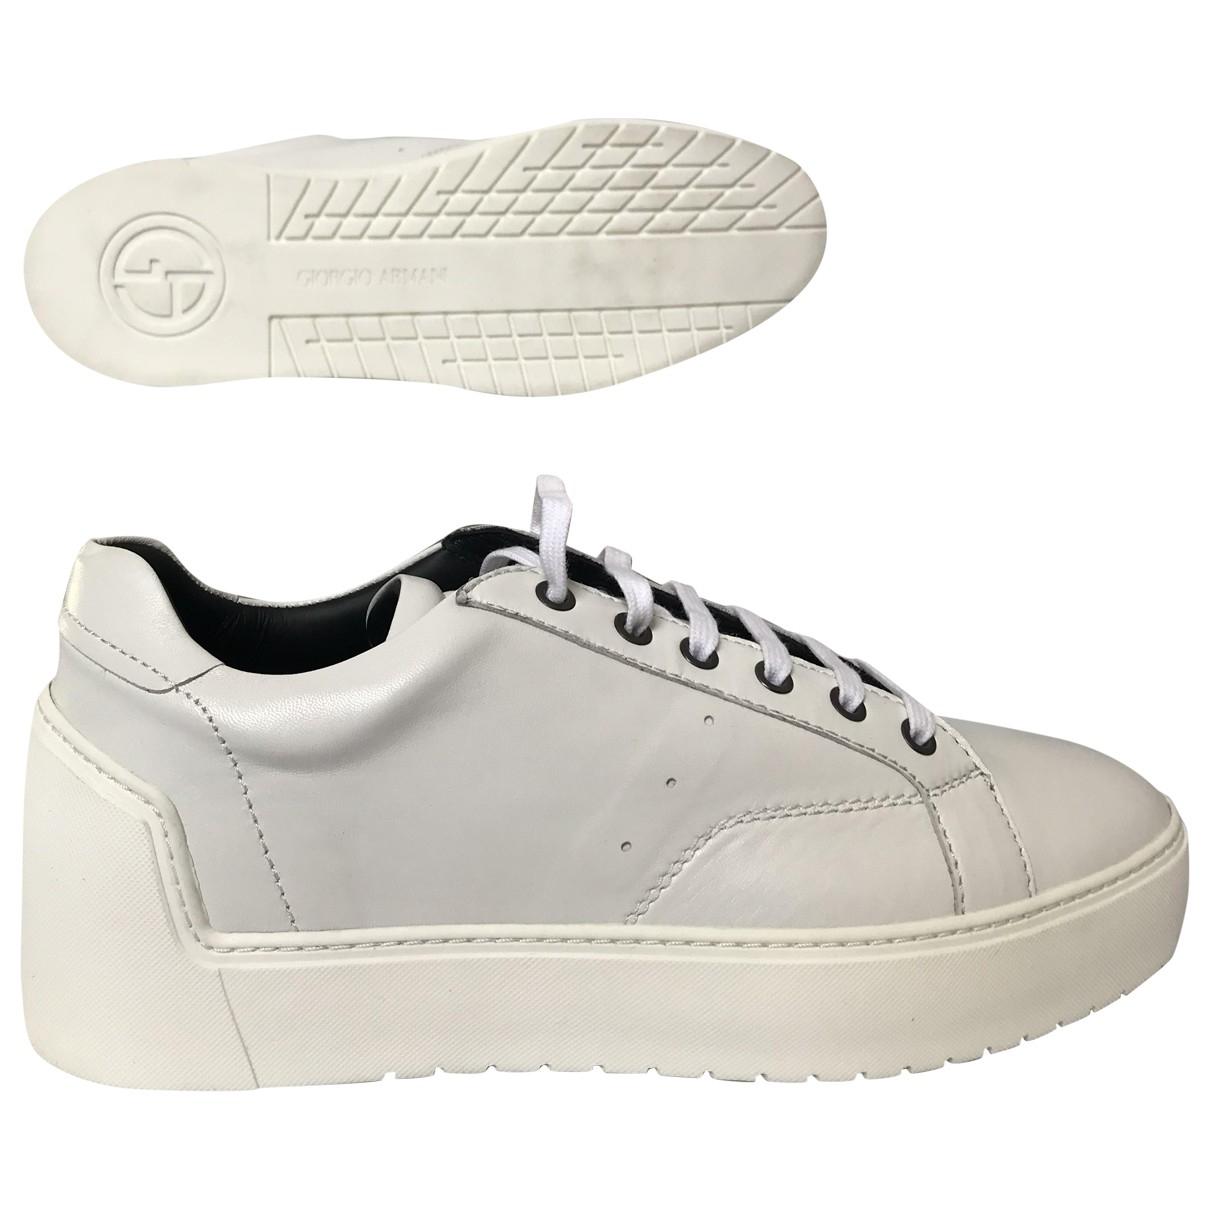 Giorgio Armani - Baskets   pour homme en cuir - blanc